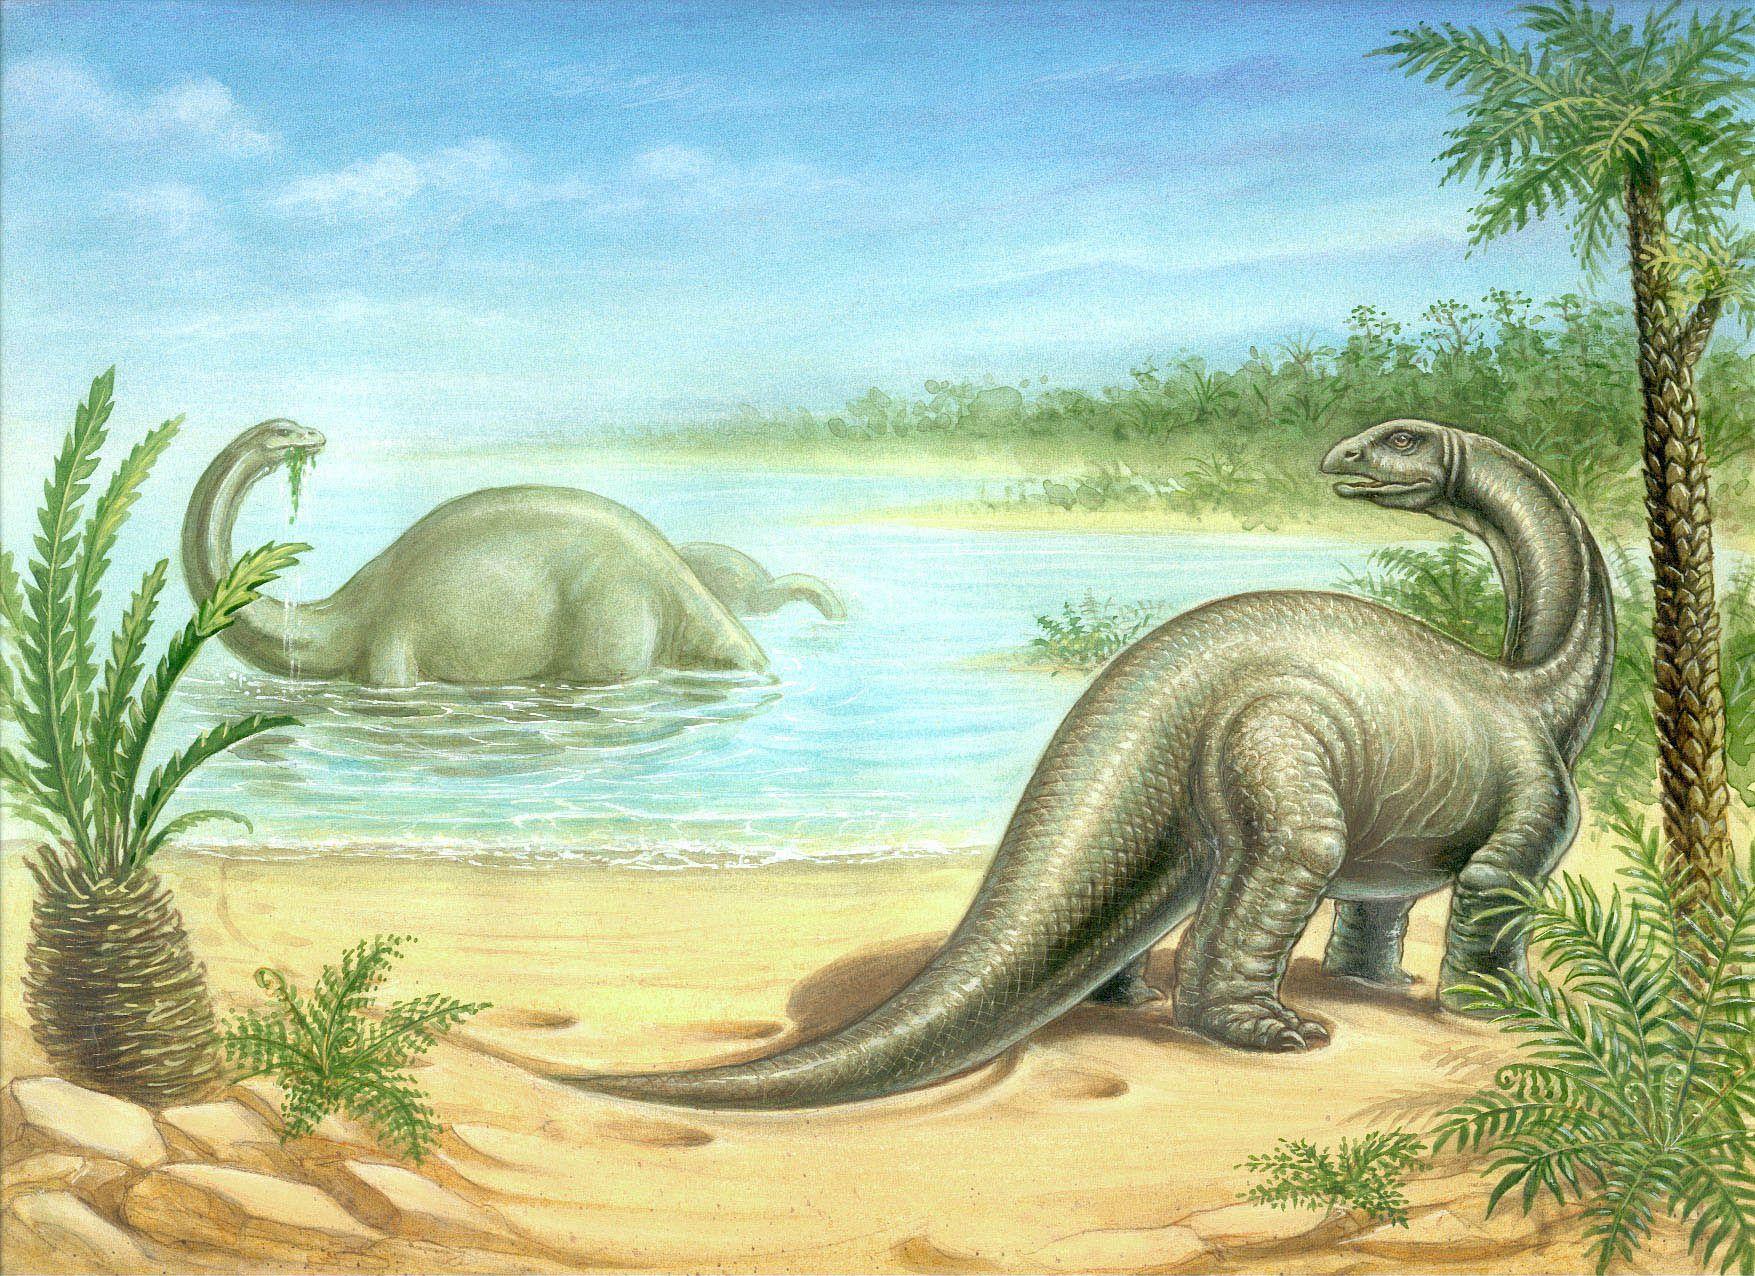 04_06_Brontosaurus